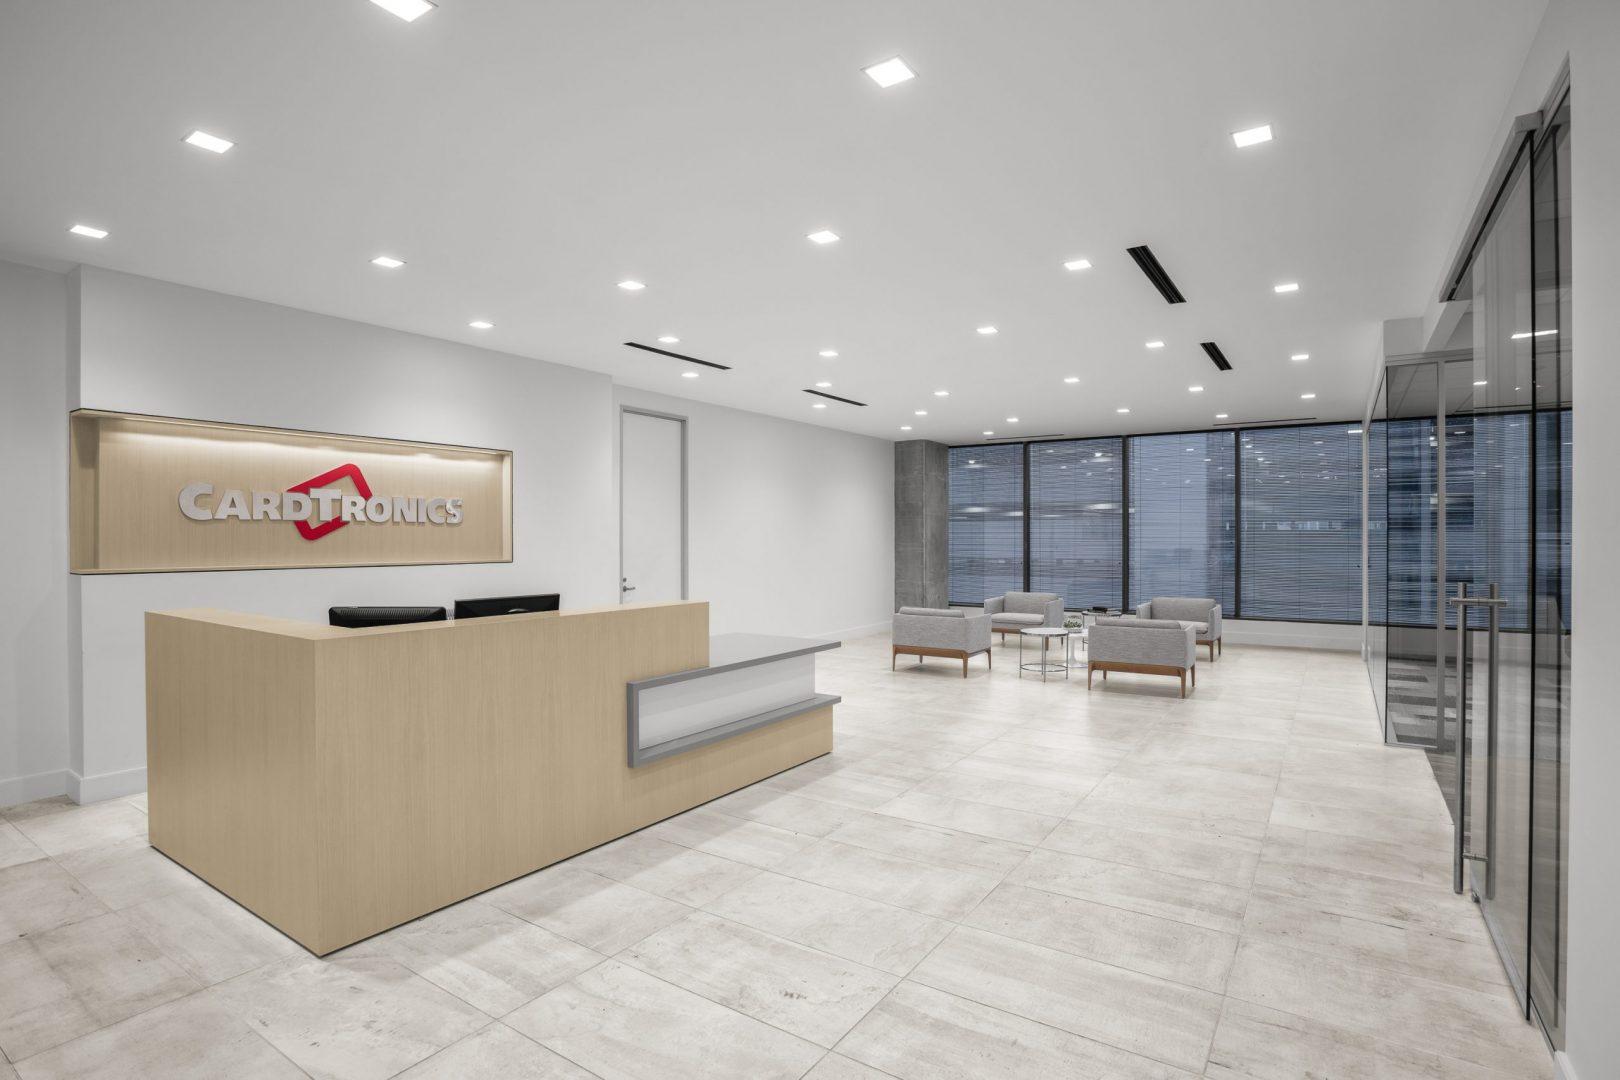 Corporate Financial Interior Design Cardtronics Reception Entrance Lobby